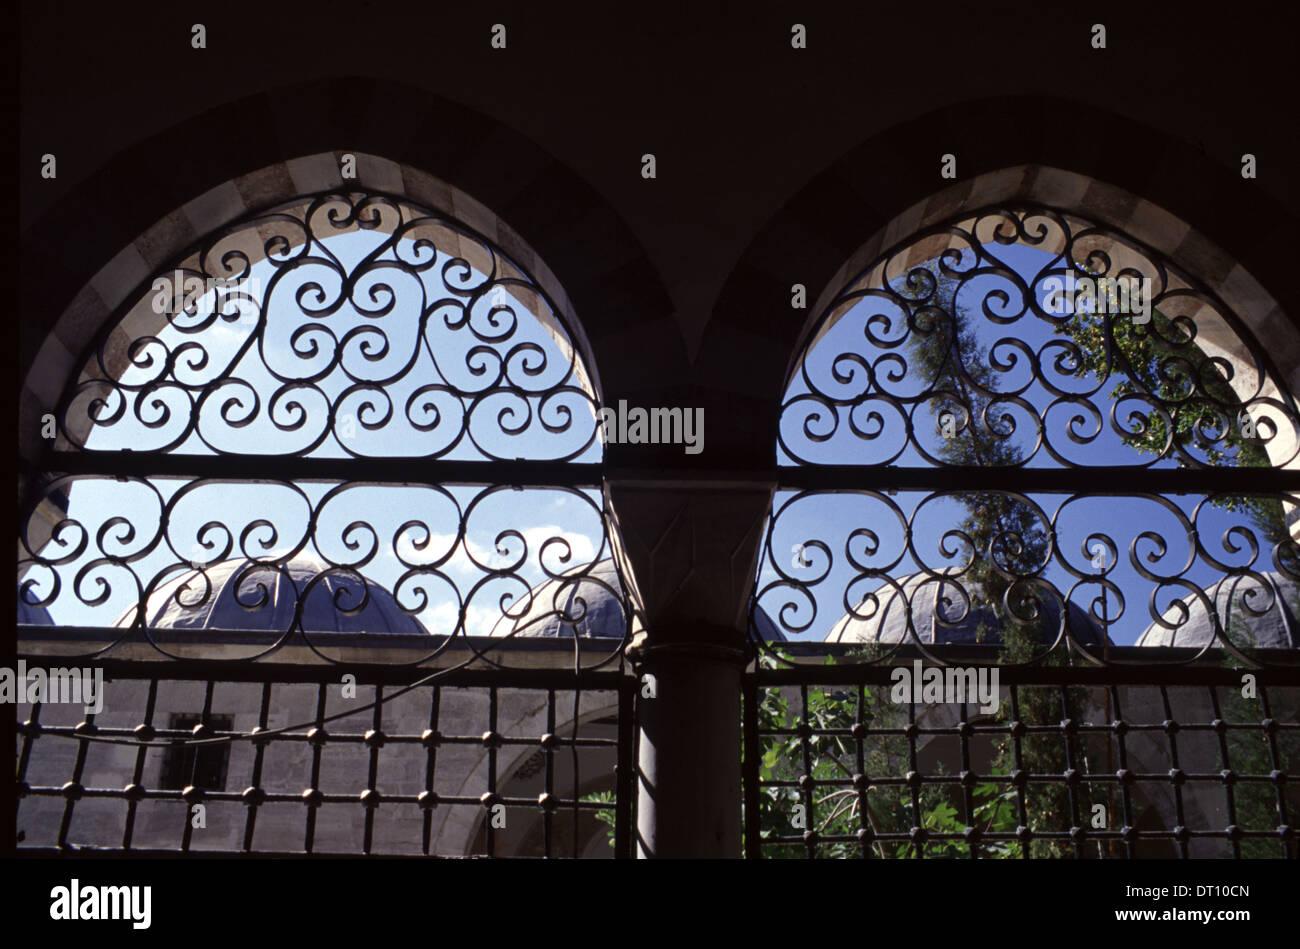 Cast Iron railings of Nuruosmaniye Mosque located in the Cemberlitas neighbourhood of Fatih district Istanbul - Stock Image